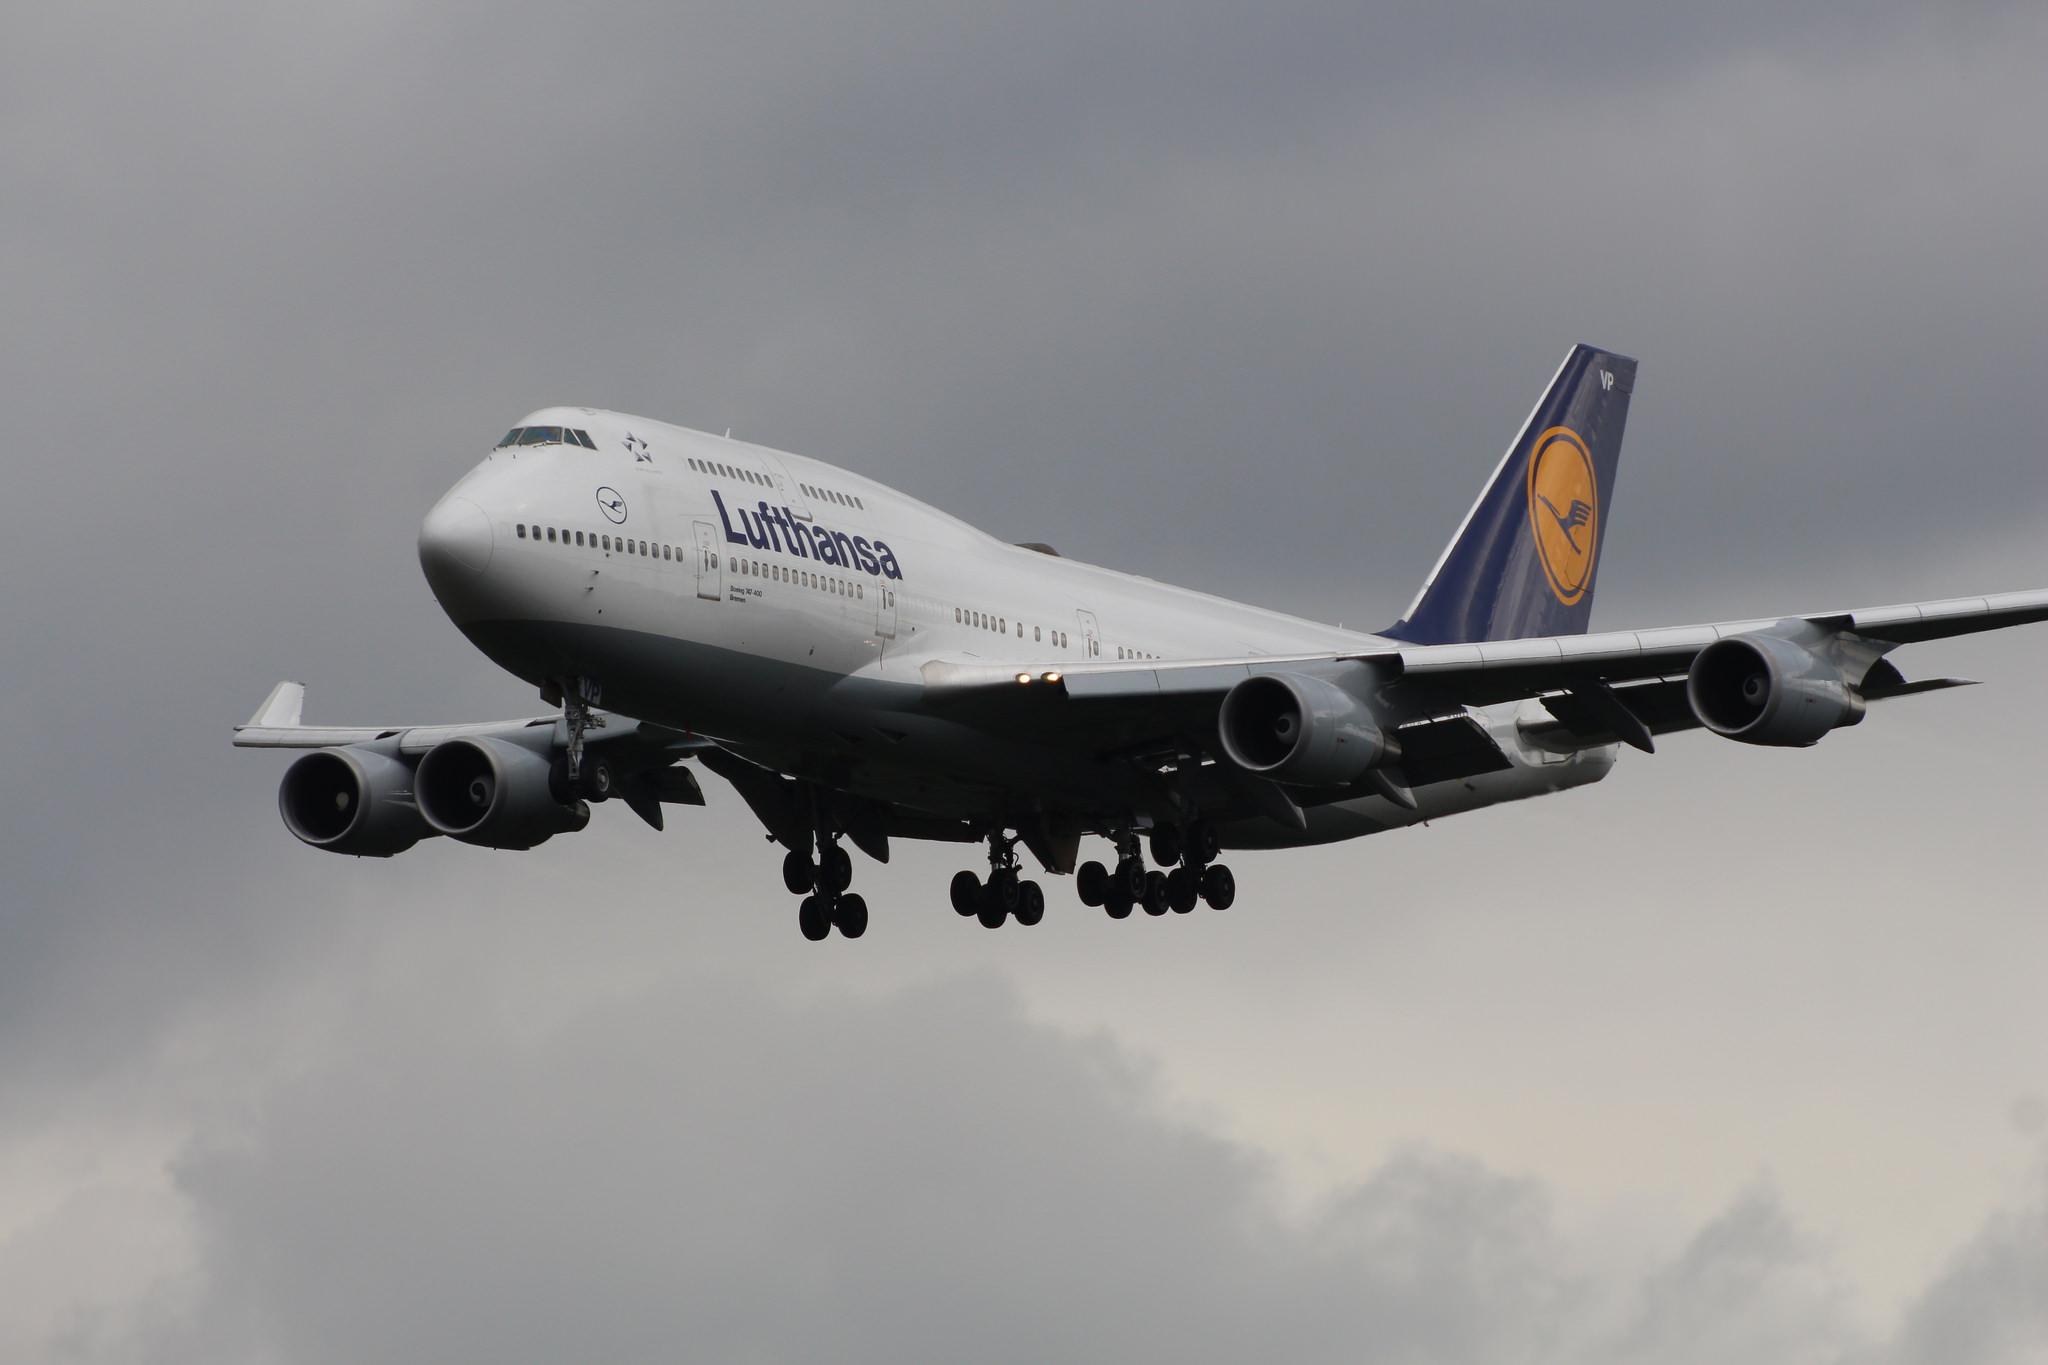 leil.de/di/pics/747_lufthansa_landet_in_frankfurt.jpg